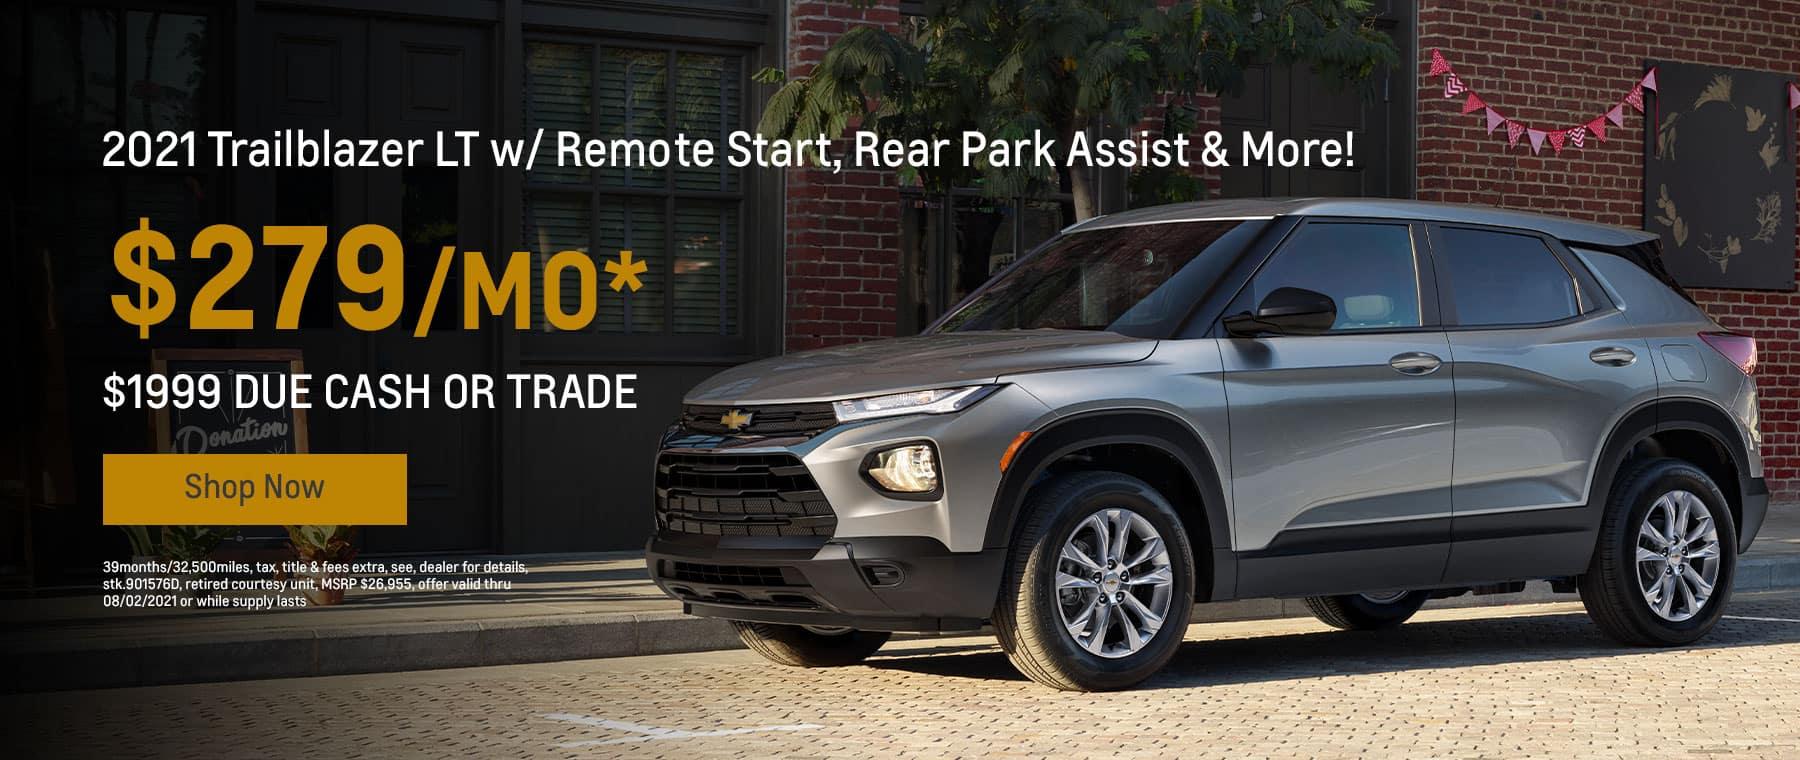 2021 Trailblazer LT w/ Remote Start, Rear Park Assist & More! $279mo.*